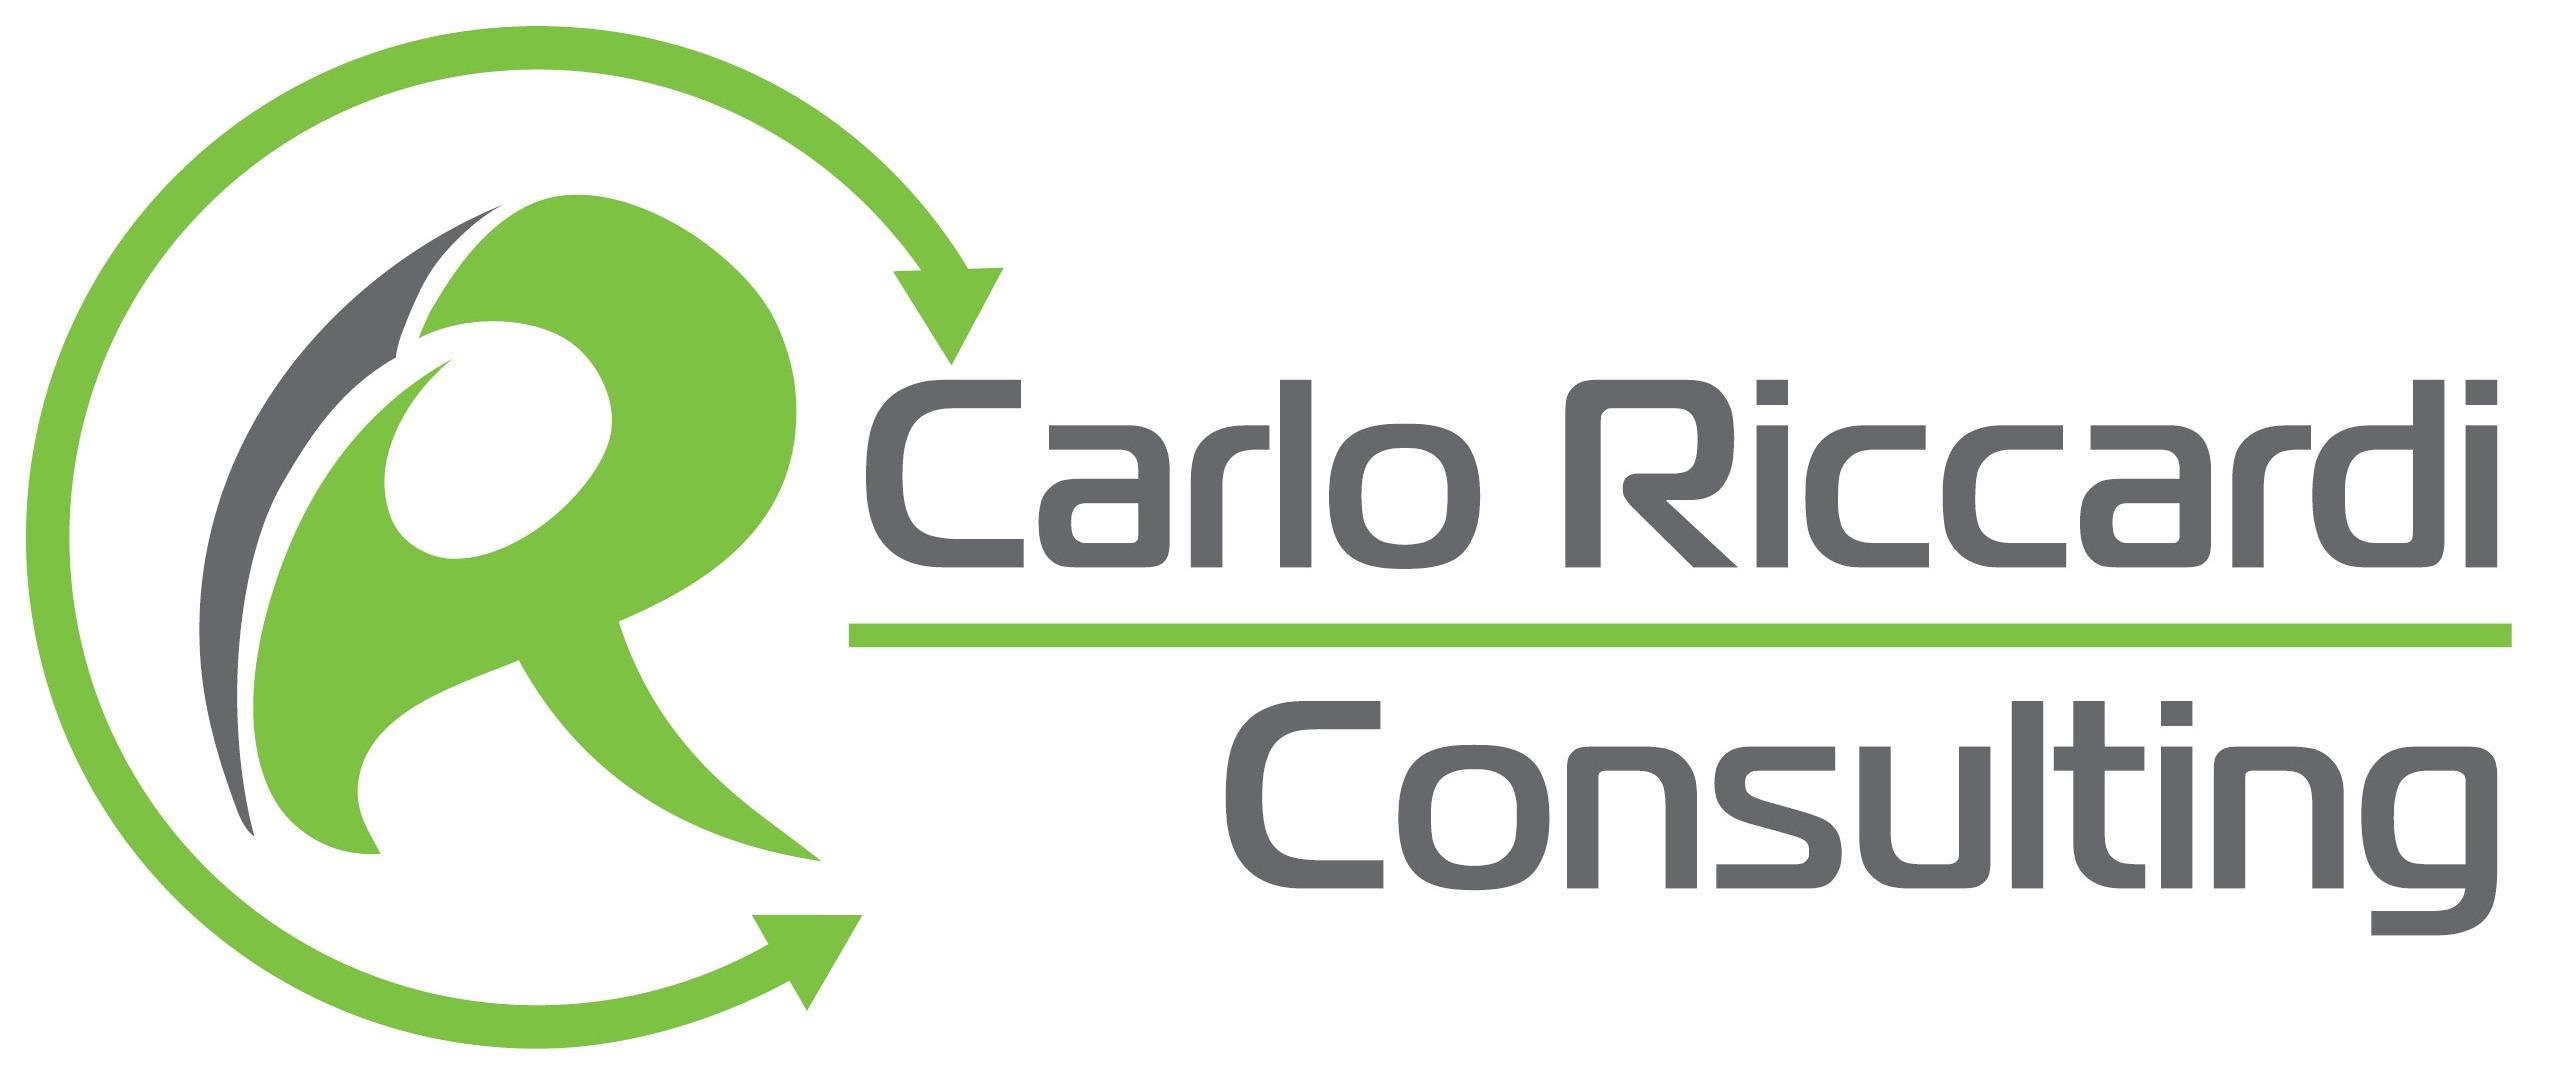 Carlo RICCARDI Consulting Impfschutz Versicherung